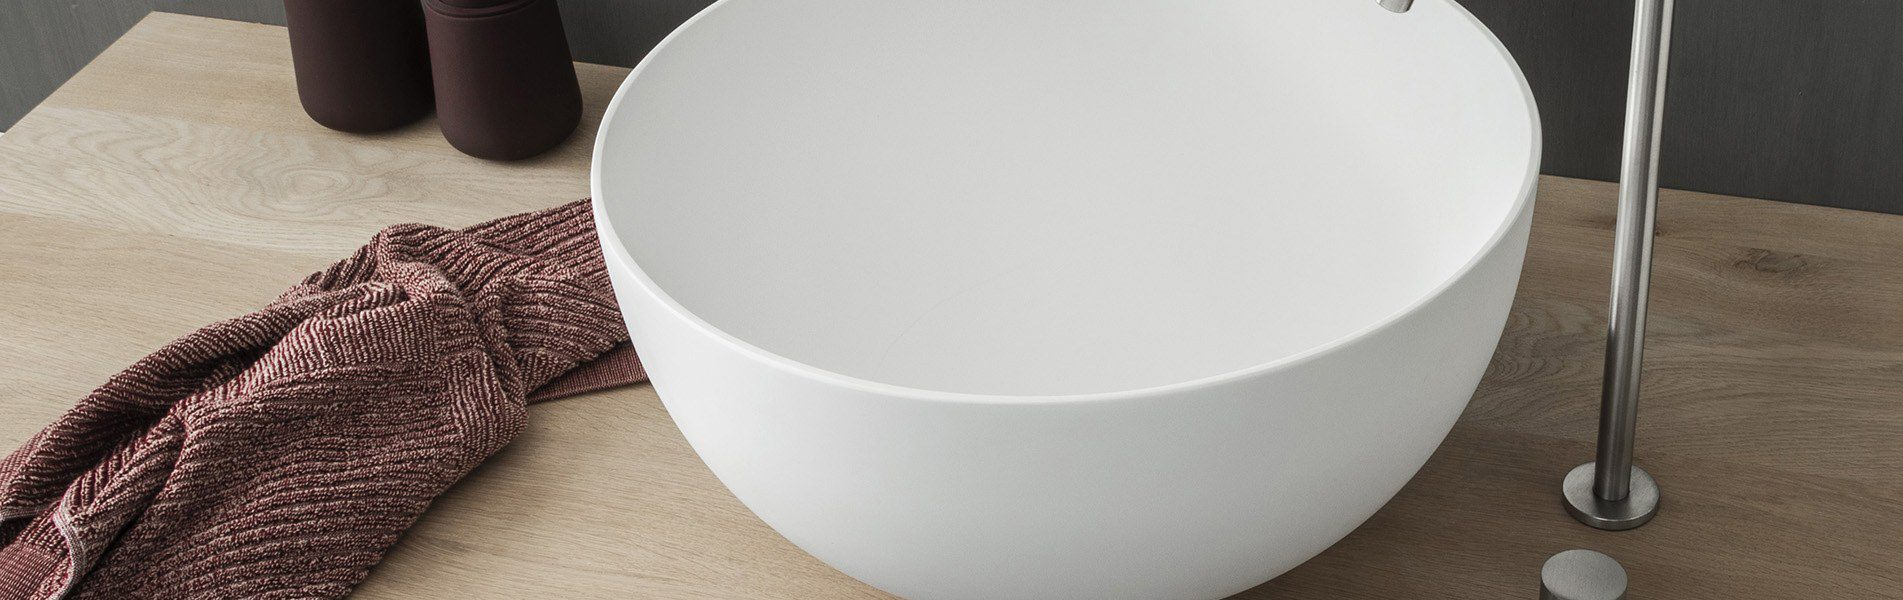 Corian Tafelblad Rond.Webshop B Dutch Design Wastafels Topkwaliteit Corian Ook